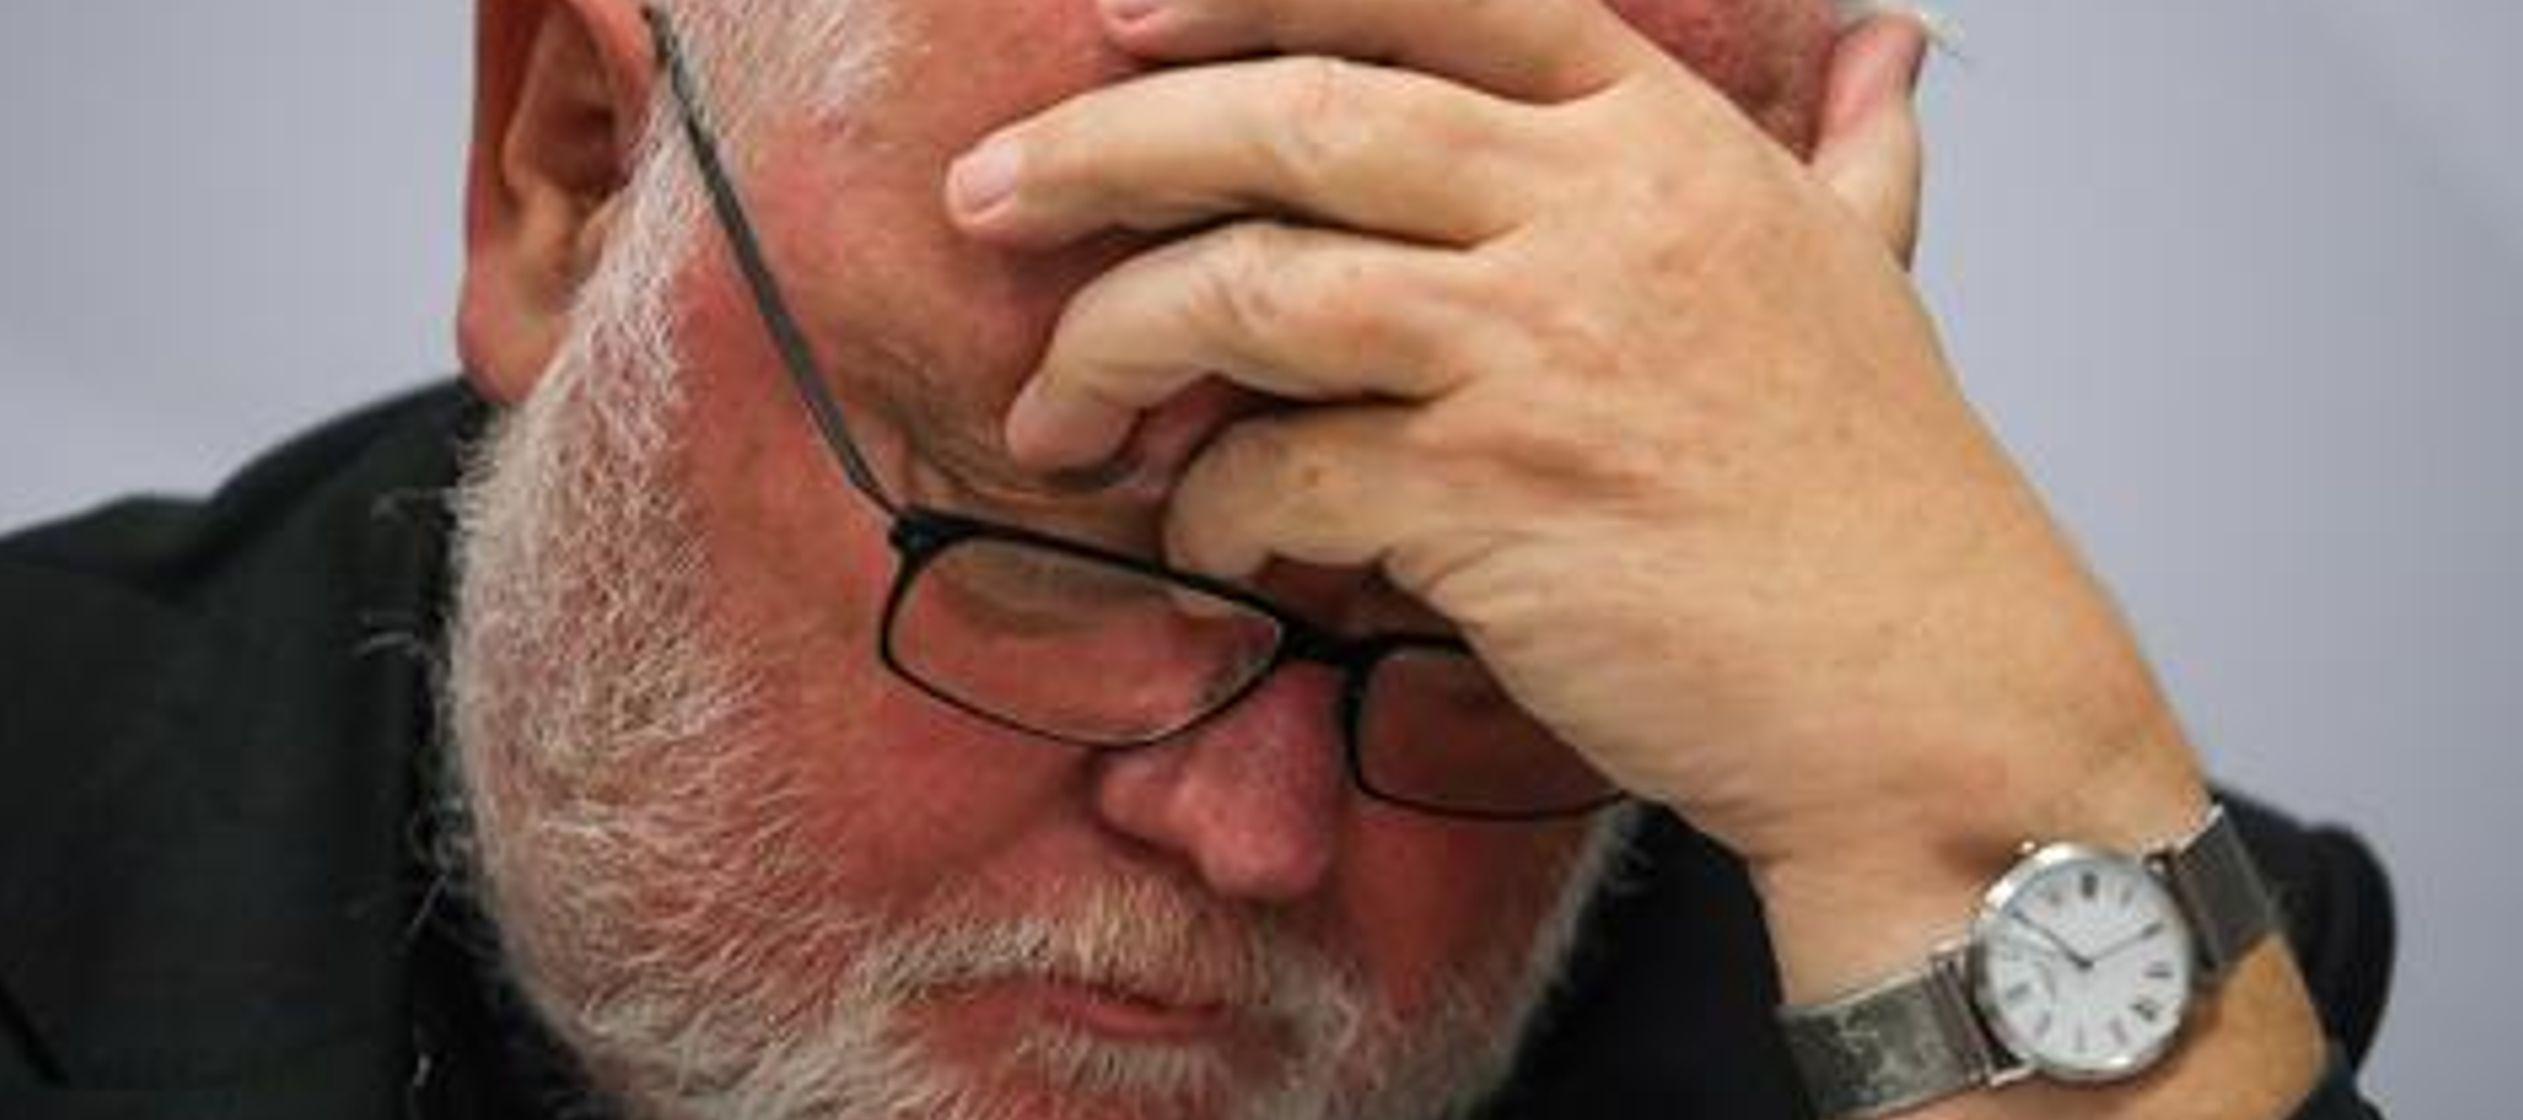 Se refirió al estudio sobre casos de abusos de menores en la Iglesia Católica de su...